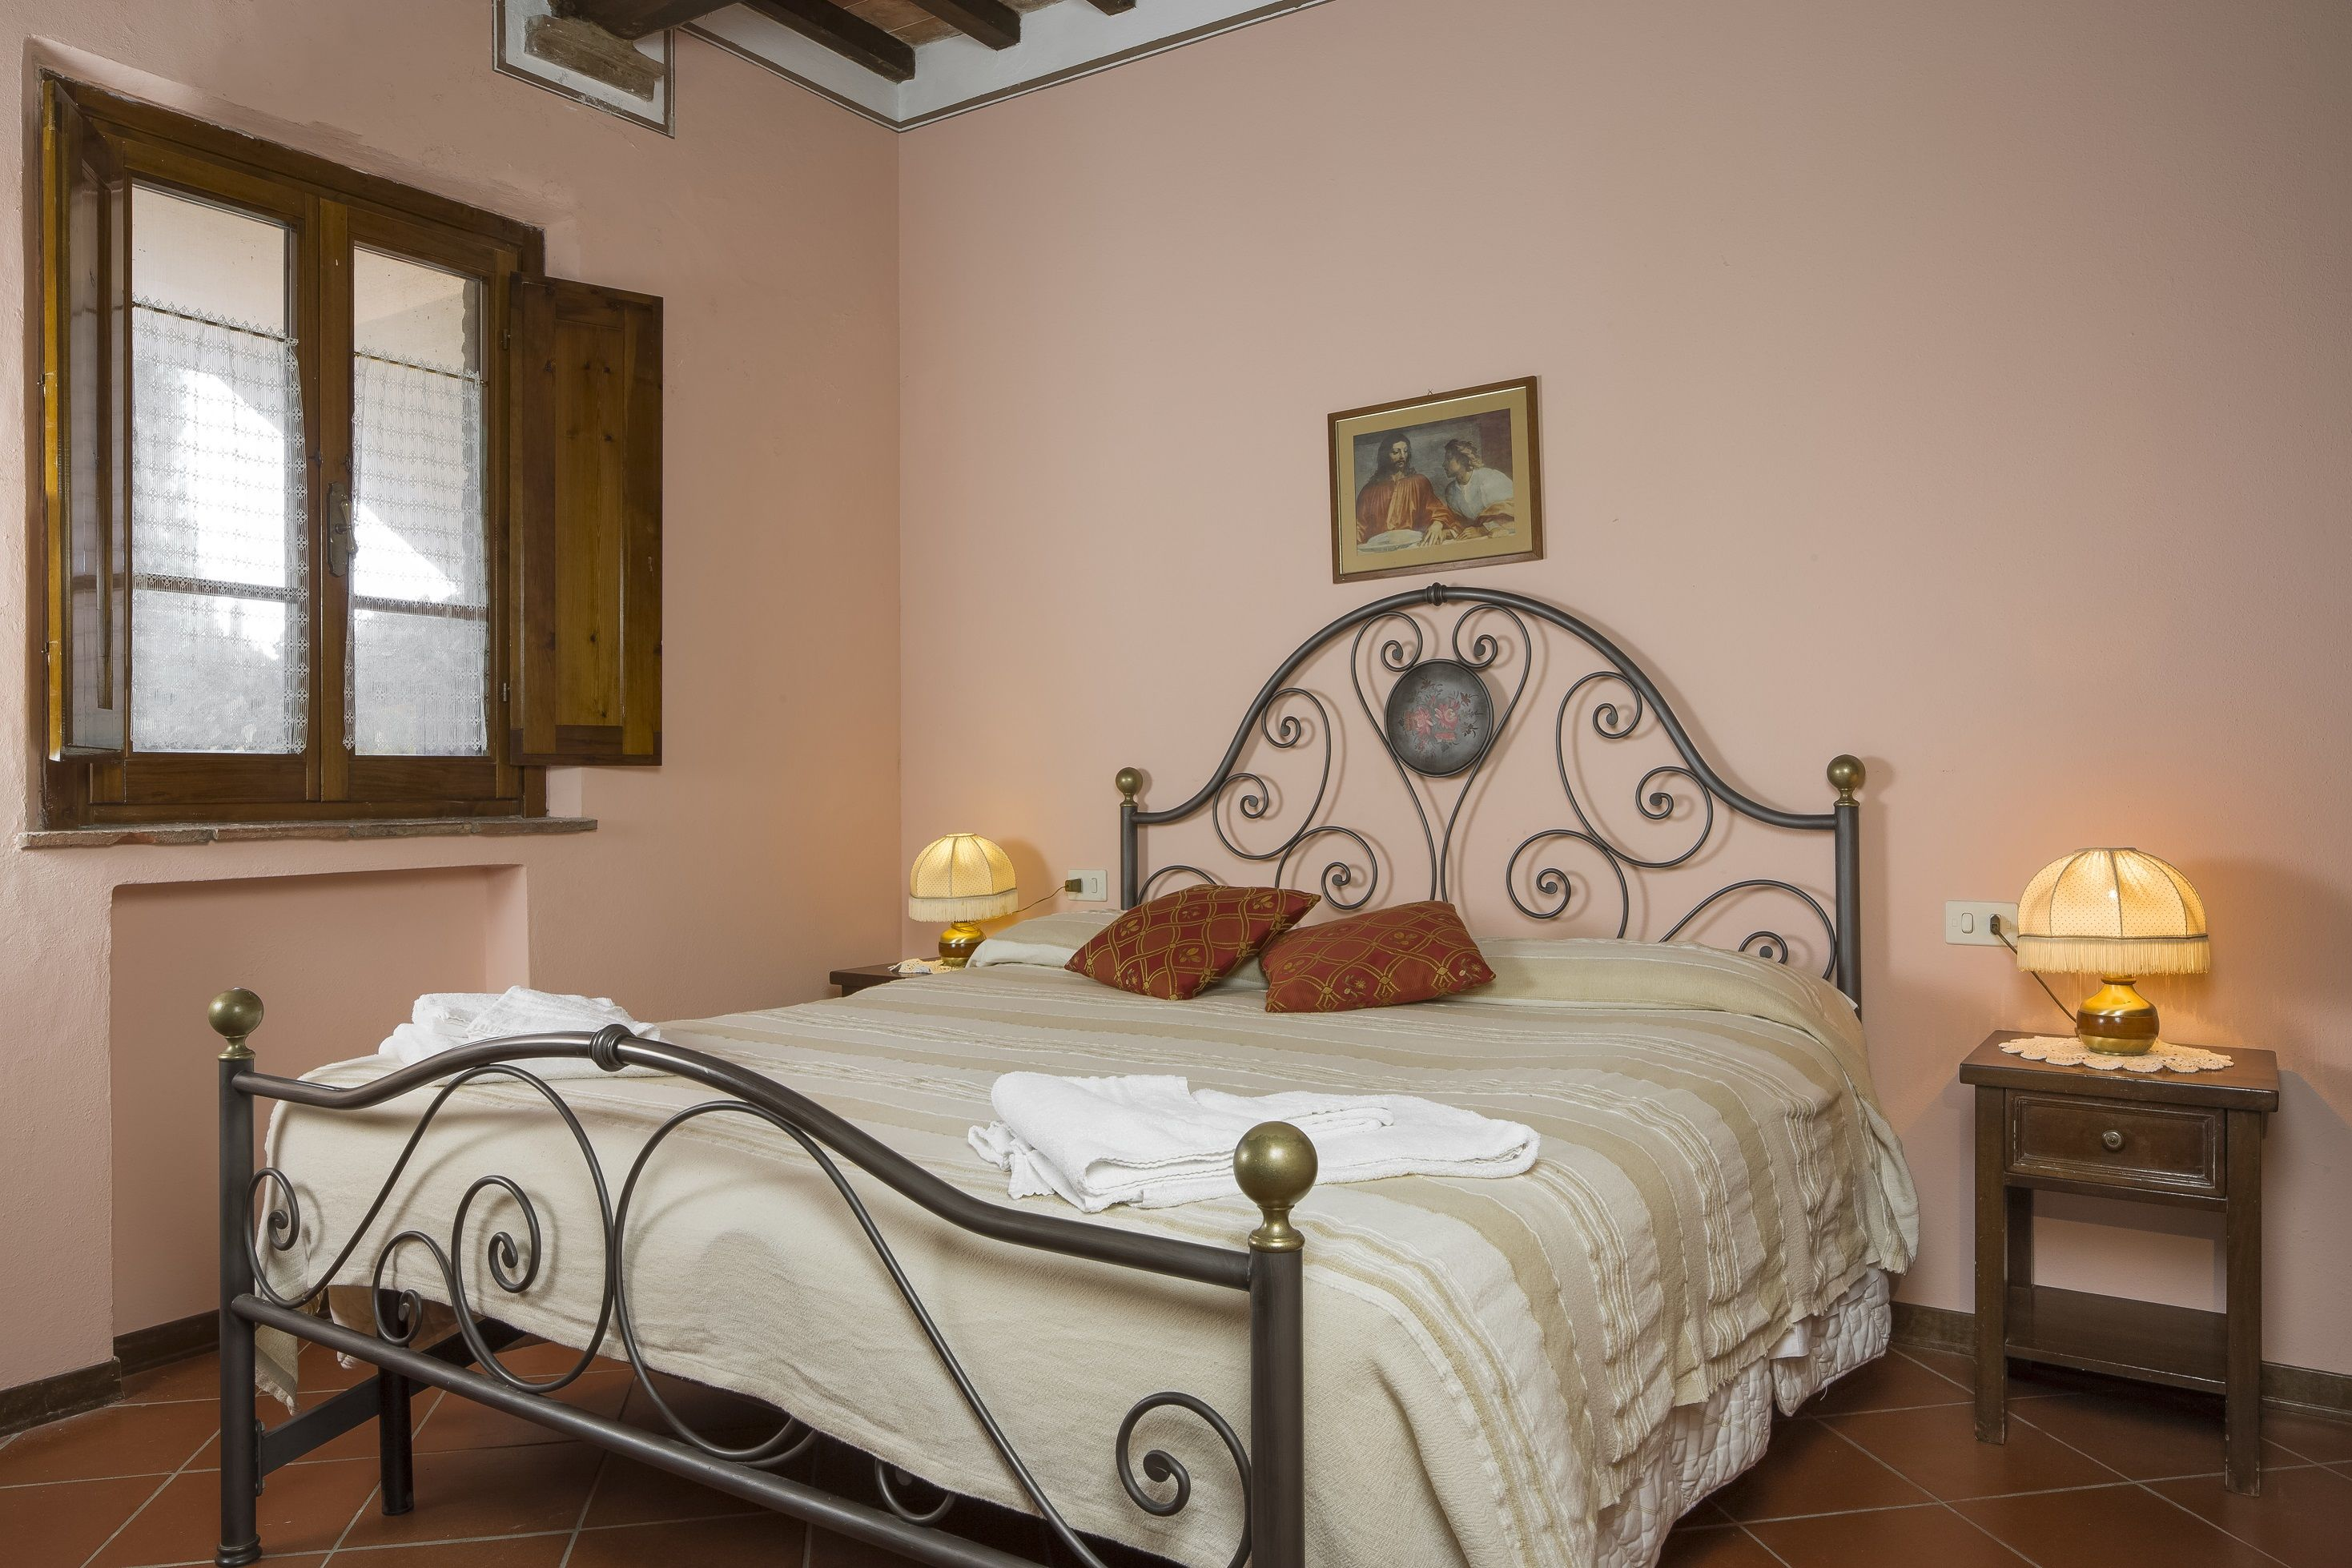 Apartment Agriturismo Il Sapito - Cherubini Holiday Home photo 16874832